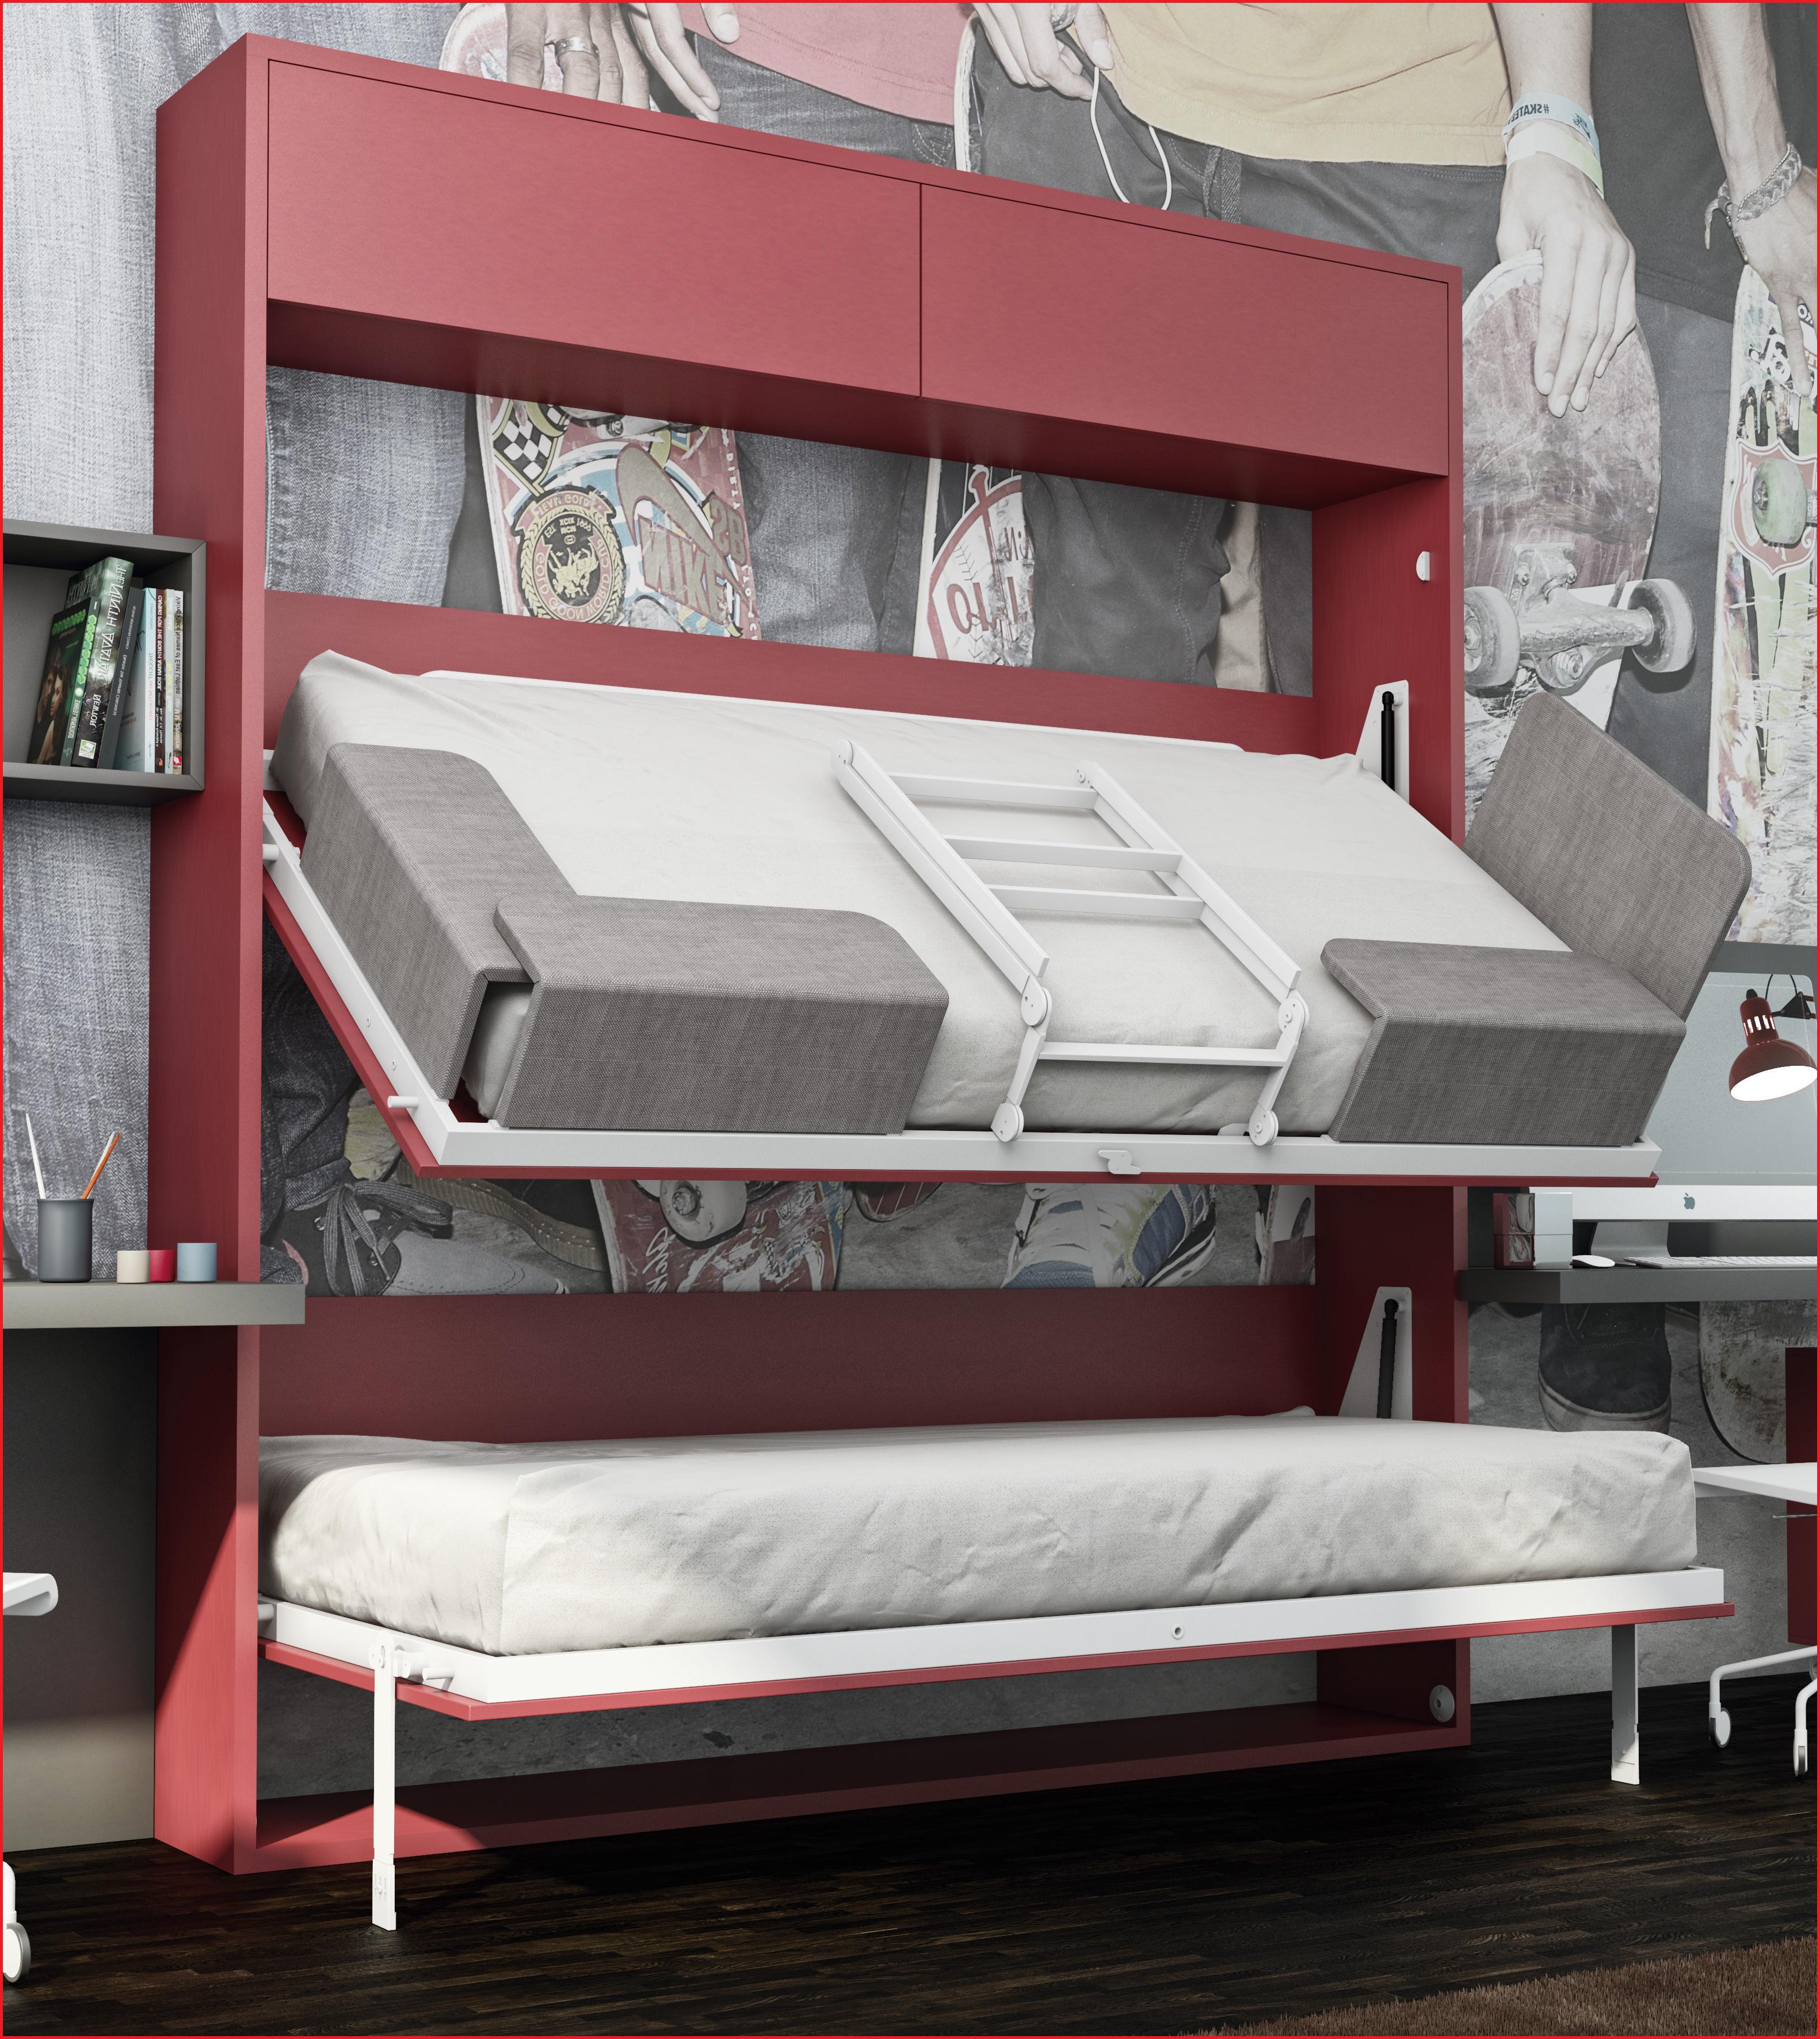 Muebles Baño Barcelona Outlet Drdp Muebles Baà O Barcelona Fabricantes De Muebles En Barcelona Con